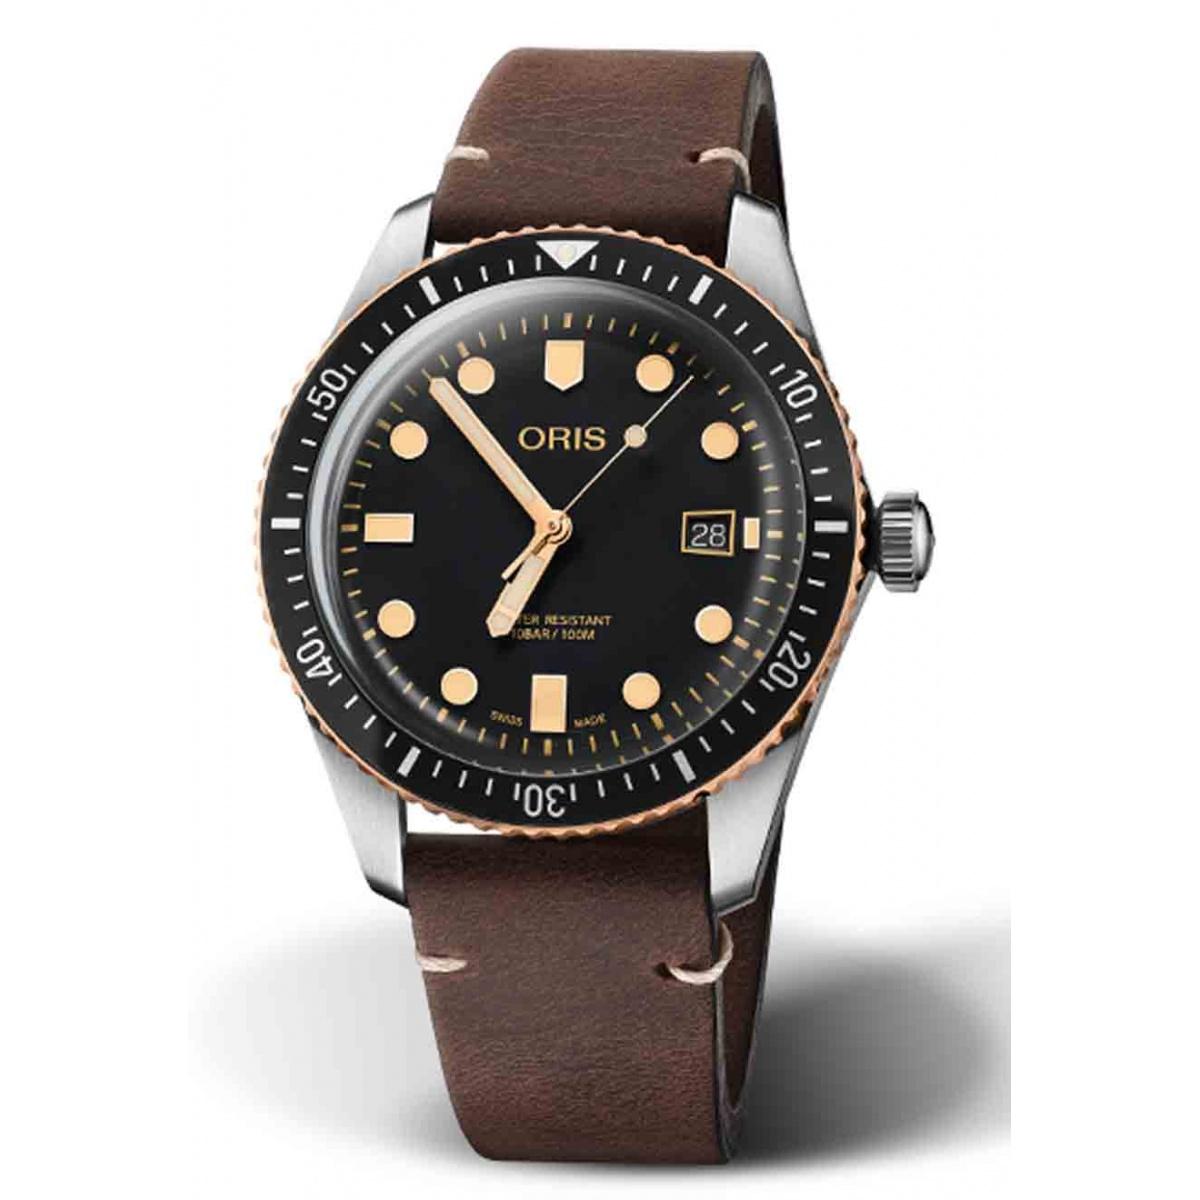 ORIS DIVERS SIXTY-FIVE 100 M ∅40 mm, Esfera negra, bronce, piel marrón oscura